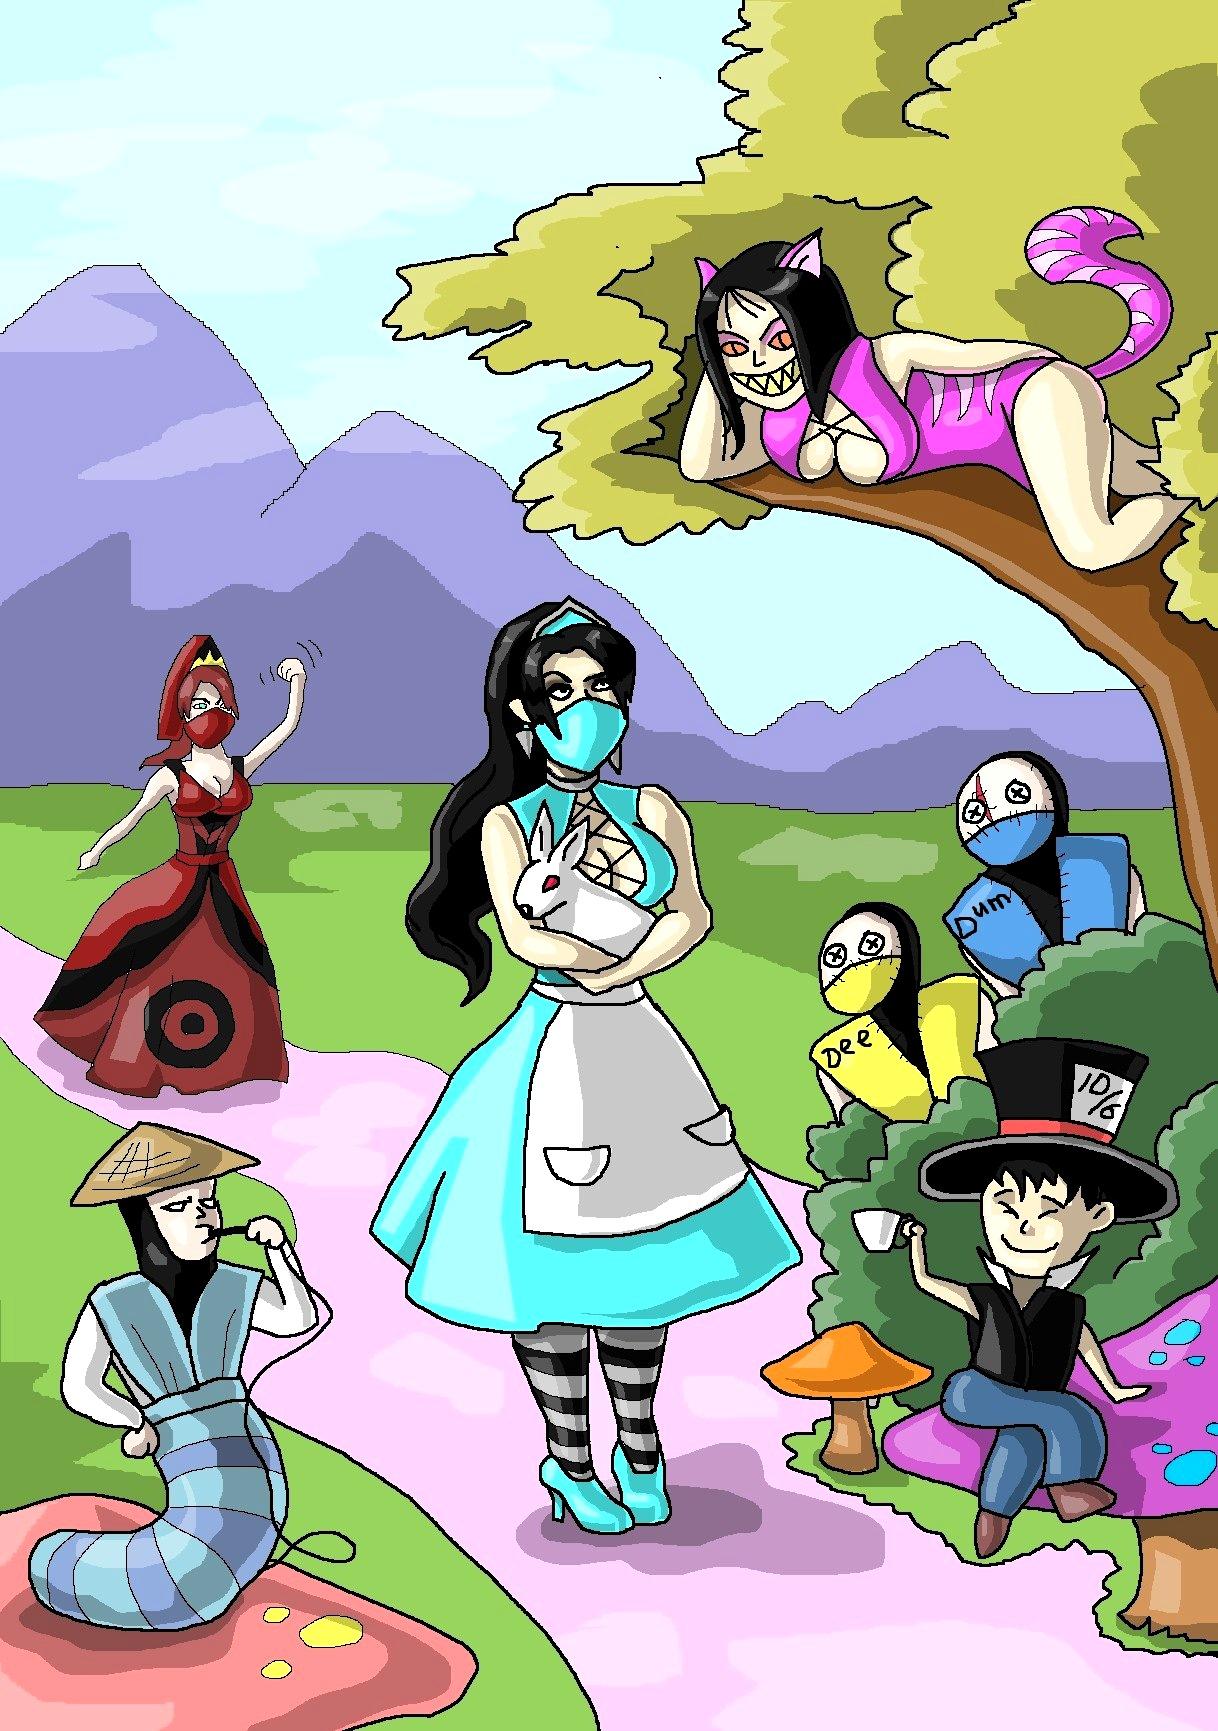 Kitana as Alice in Wonderland by Levon-Harutunyan on